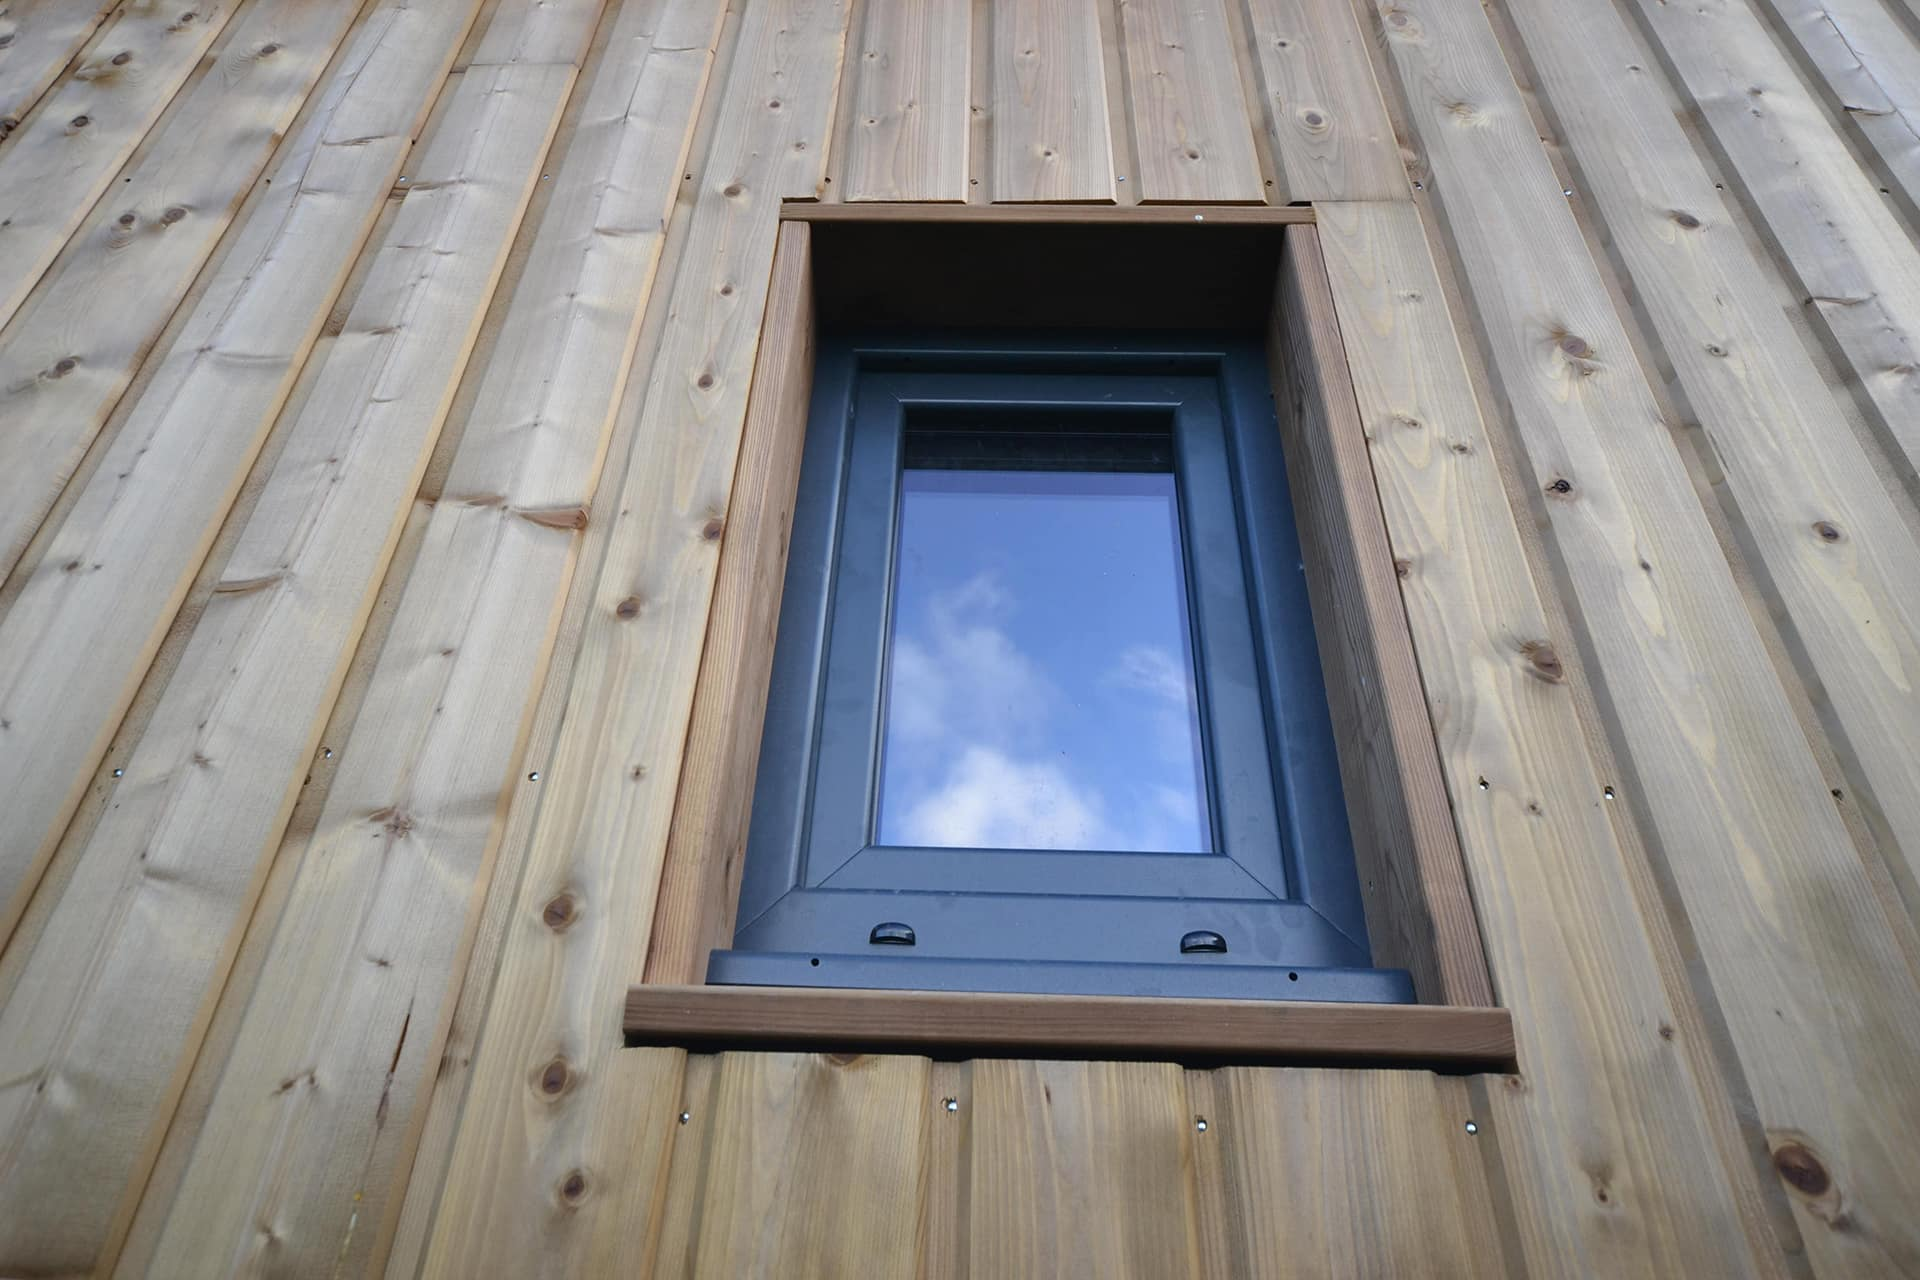 studio de jardin 20m2 vue fenetre aluminium - Studio de jardin 20m2 proche Angers 49